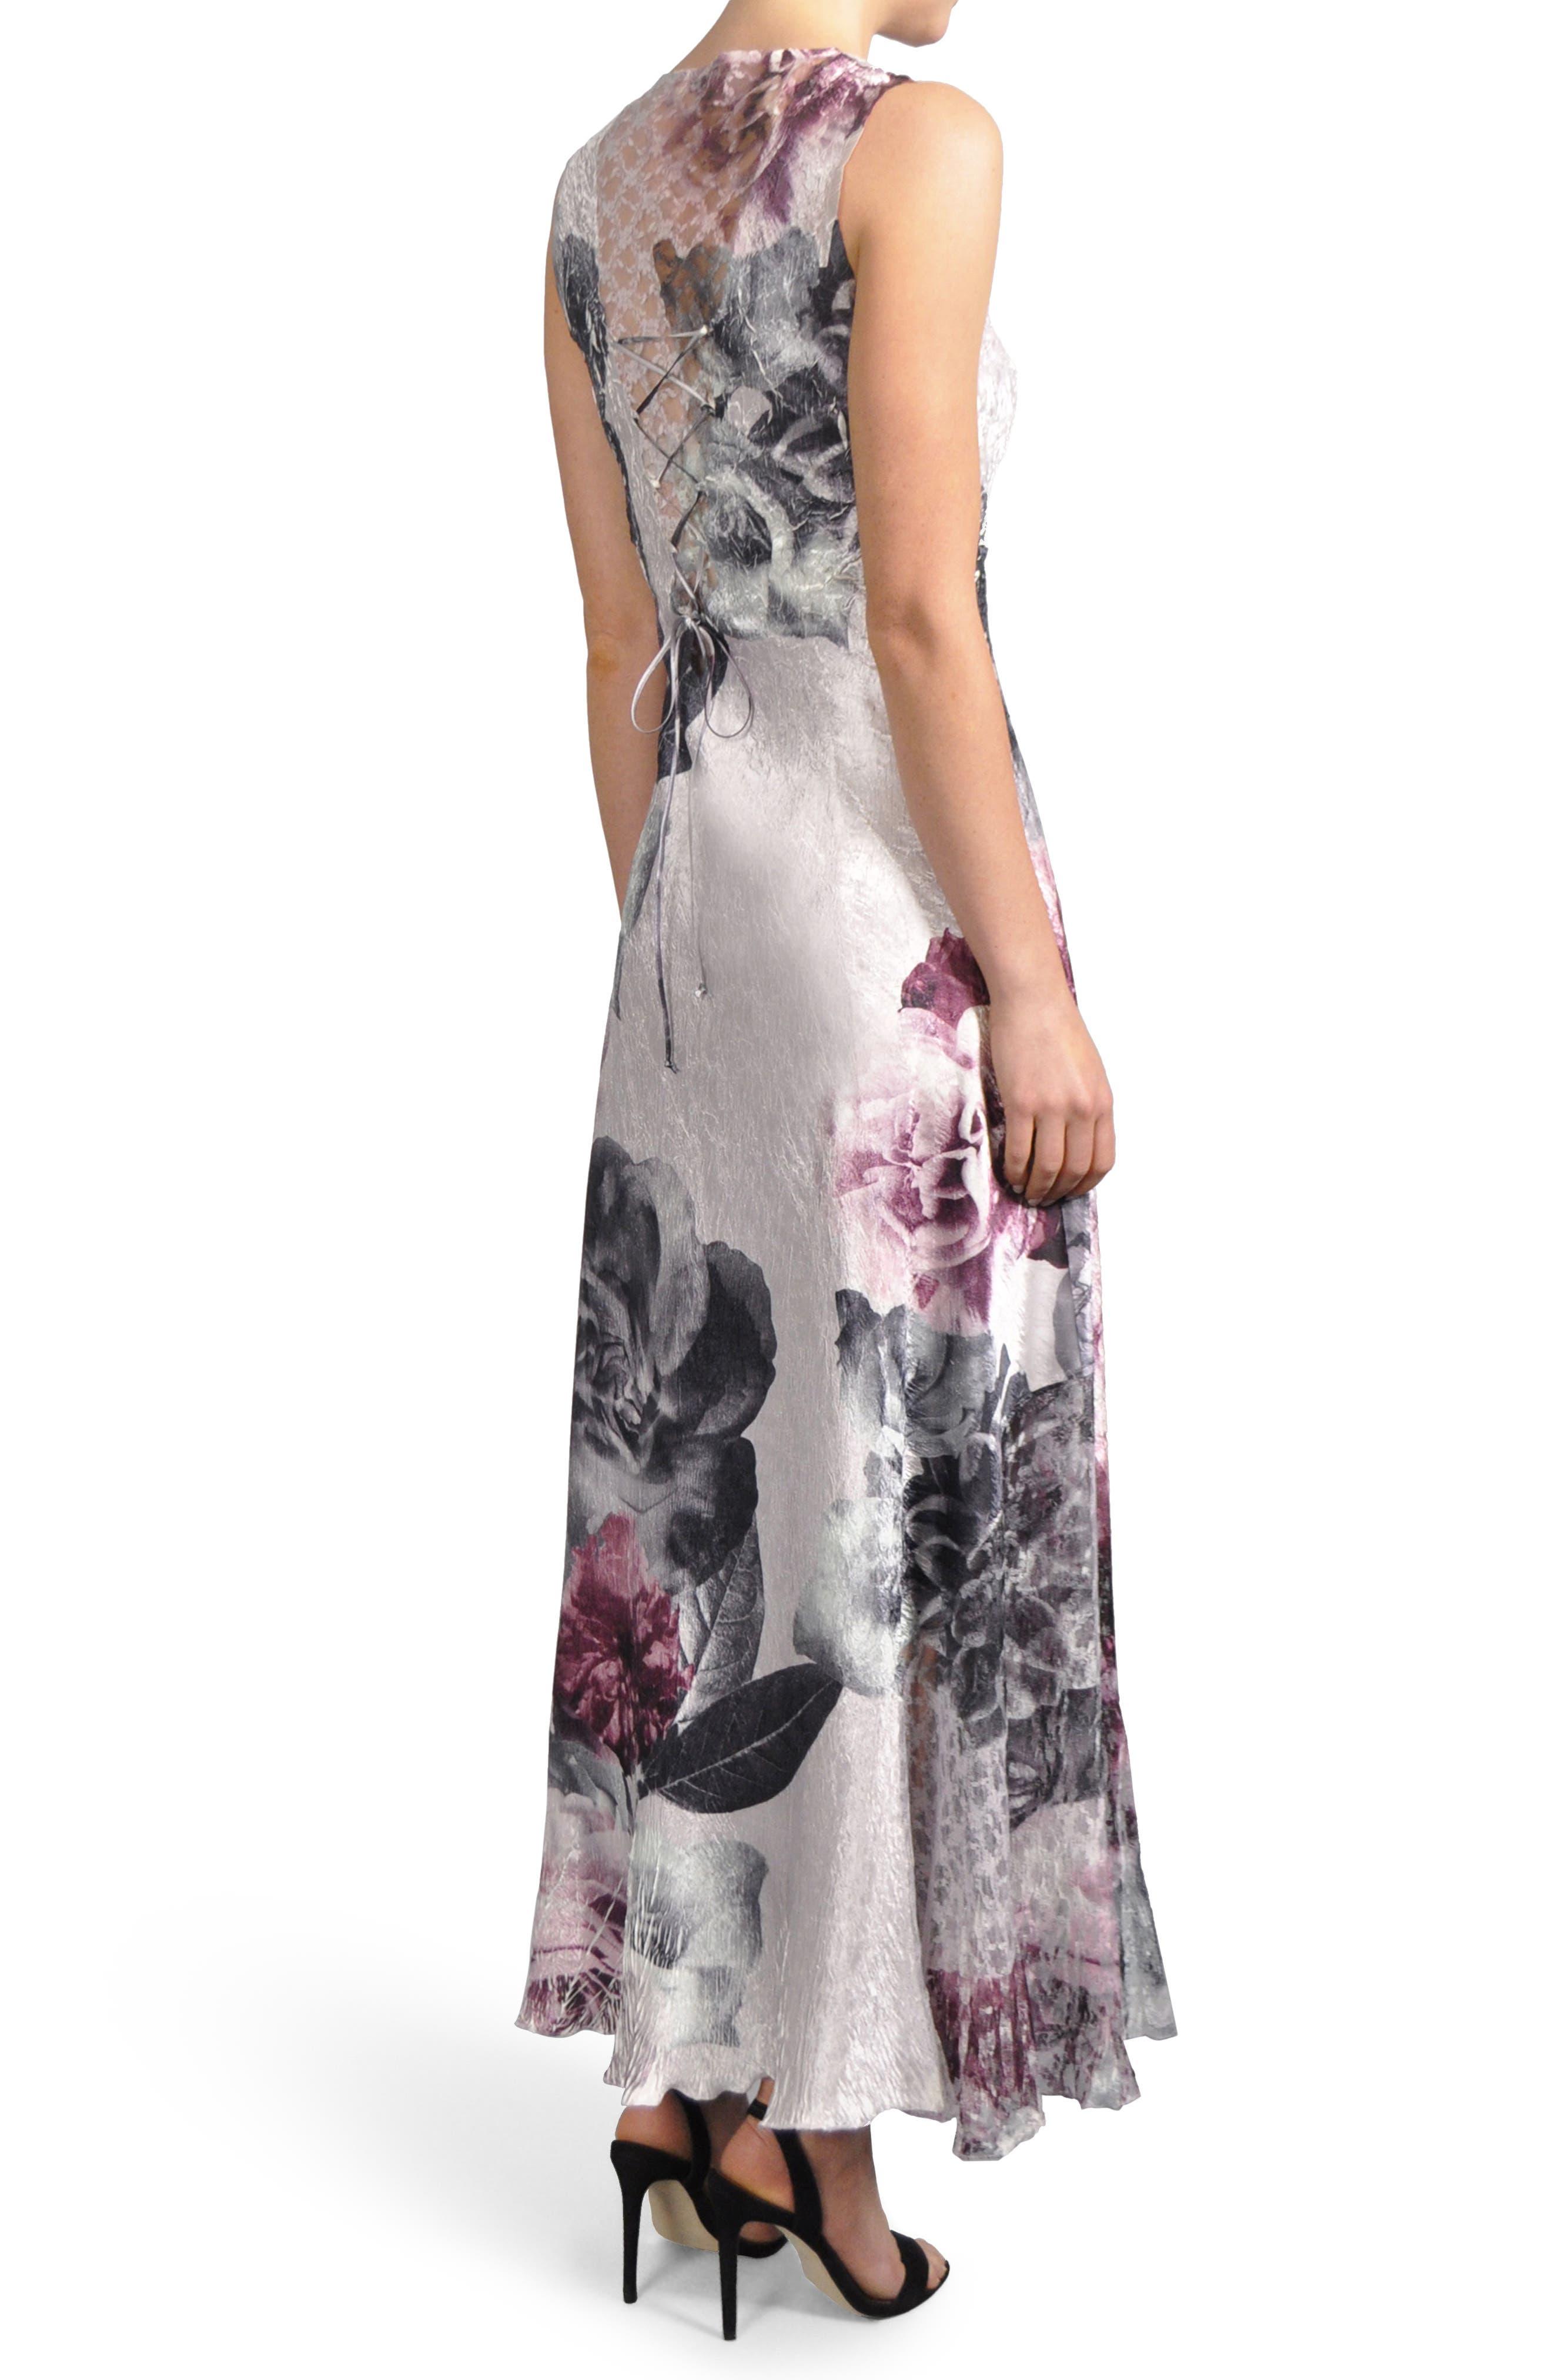 Komorav Lace-Up Back Maxi Dress with Shawl,                             Alternate thumbnail 2, color,                             508